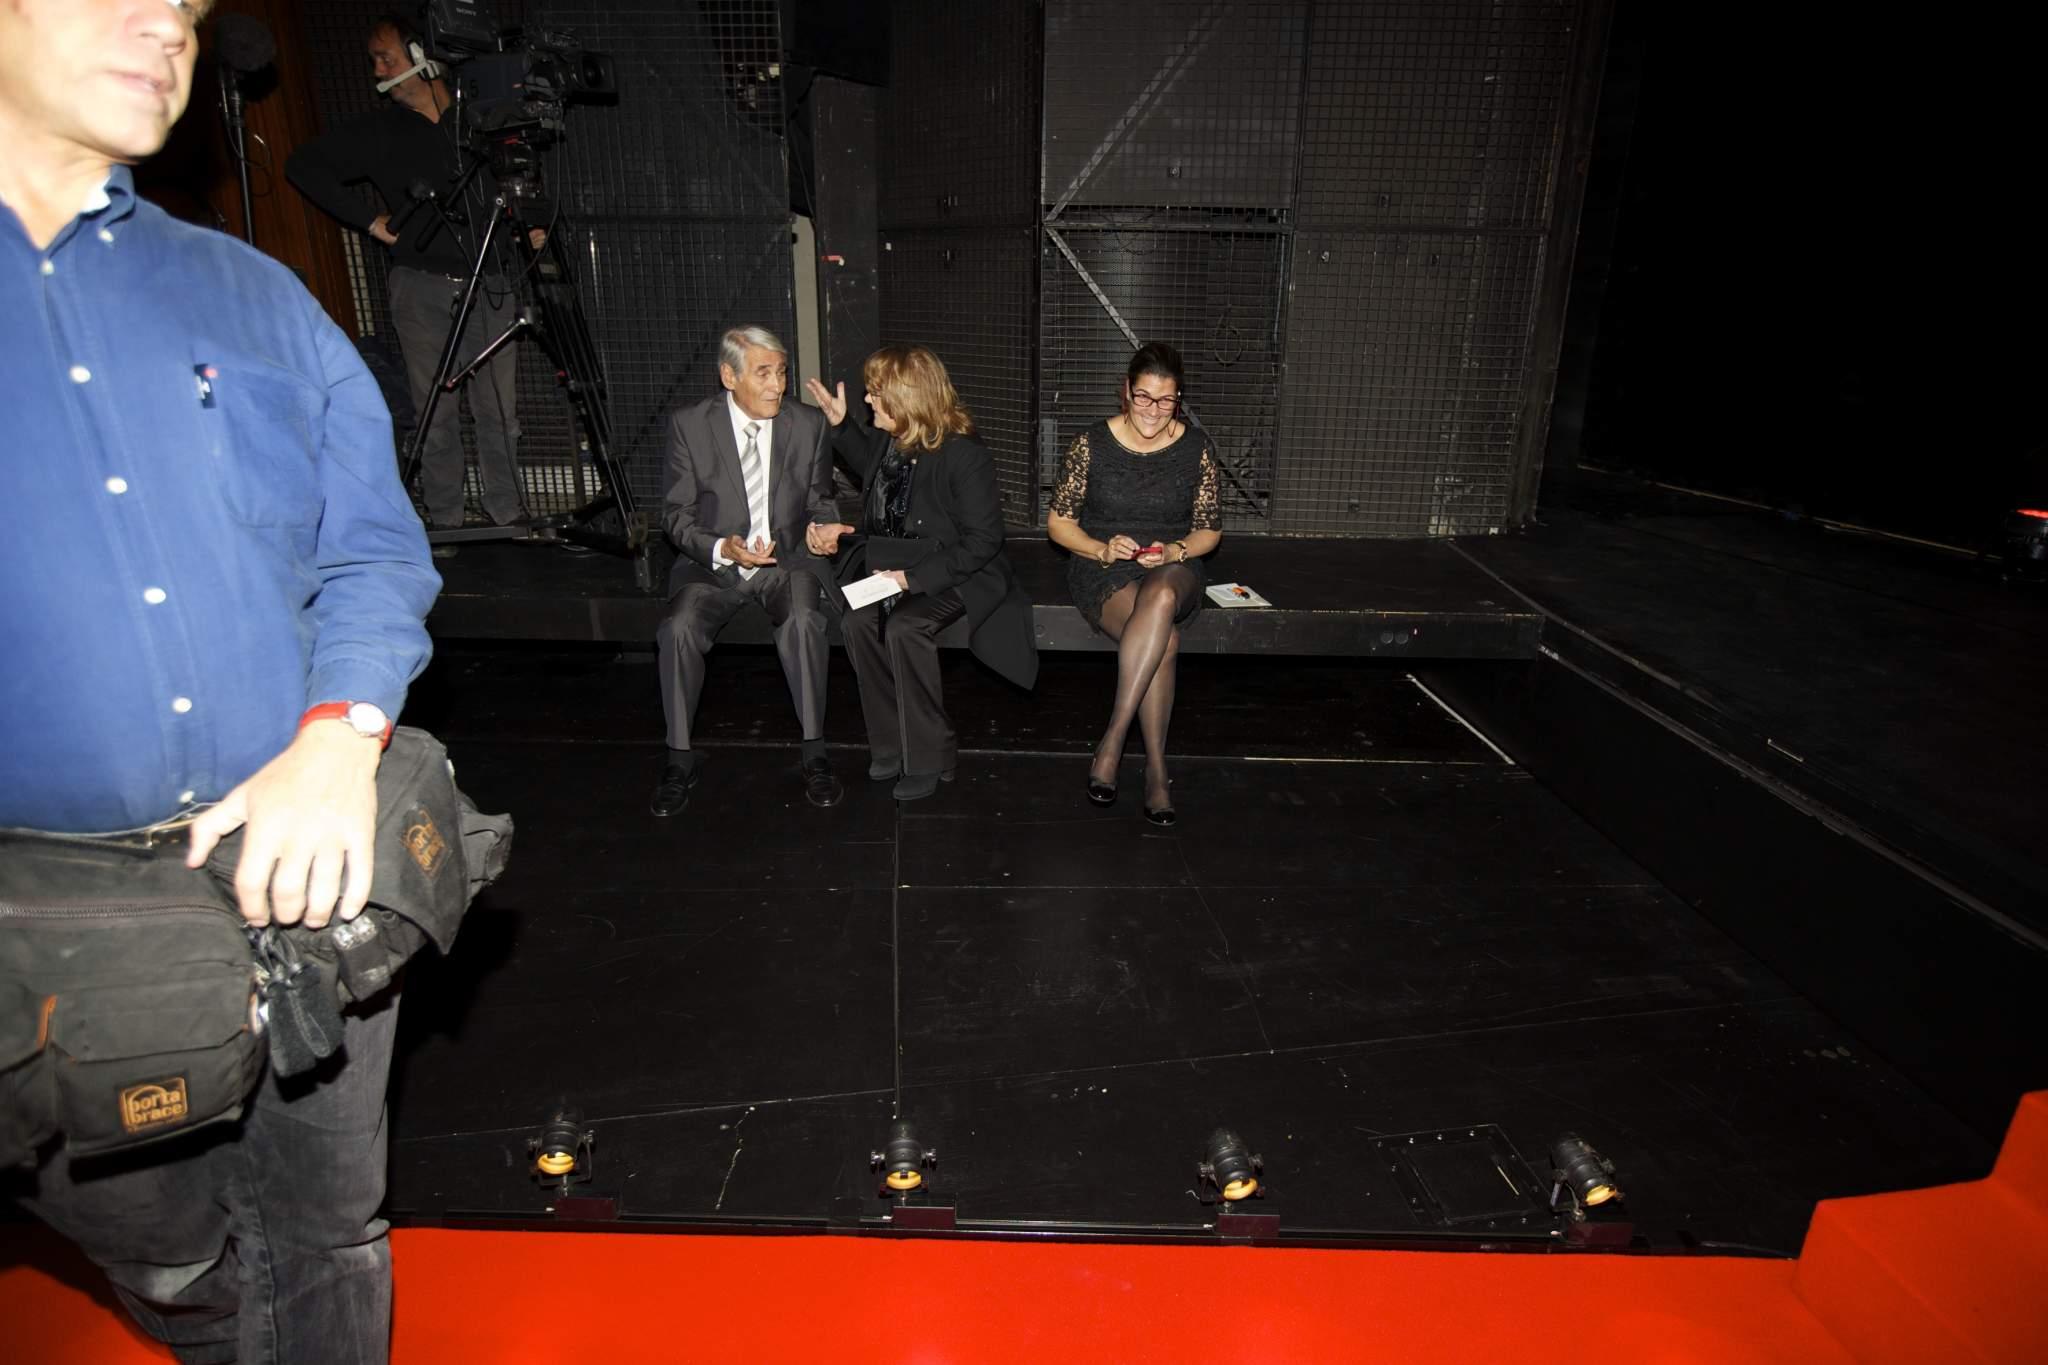 Carlo Lamprecht (Président de la Fondation du GPHG), Paola Pujia (membre du jury du GPHG 2014) et Sasha Camperio (Managing Director de Quintessentially Events SA)